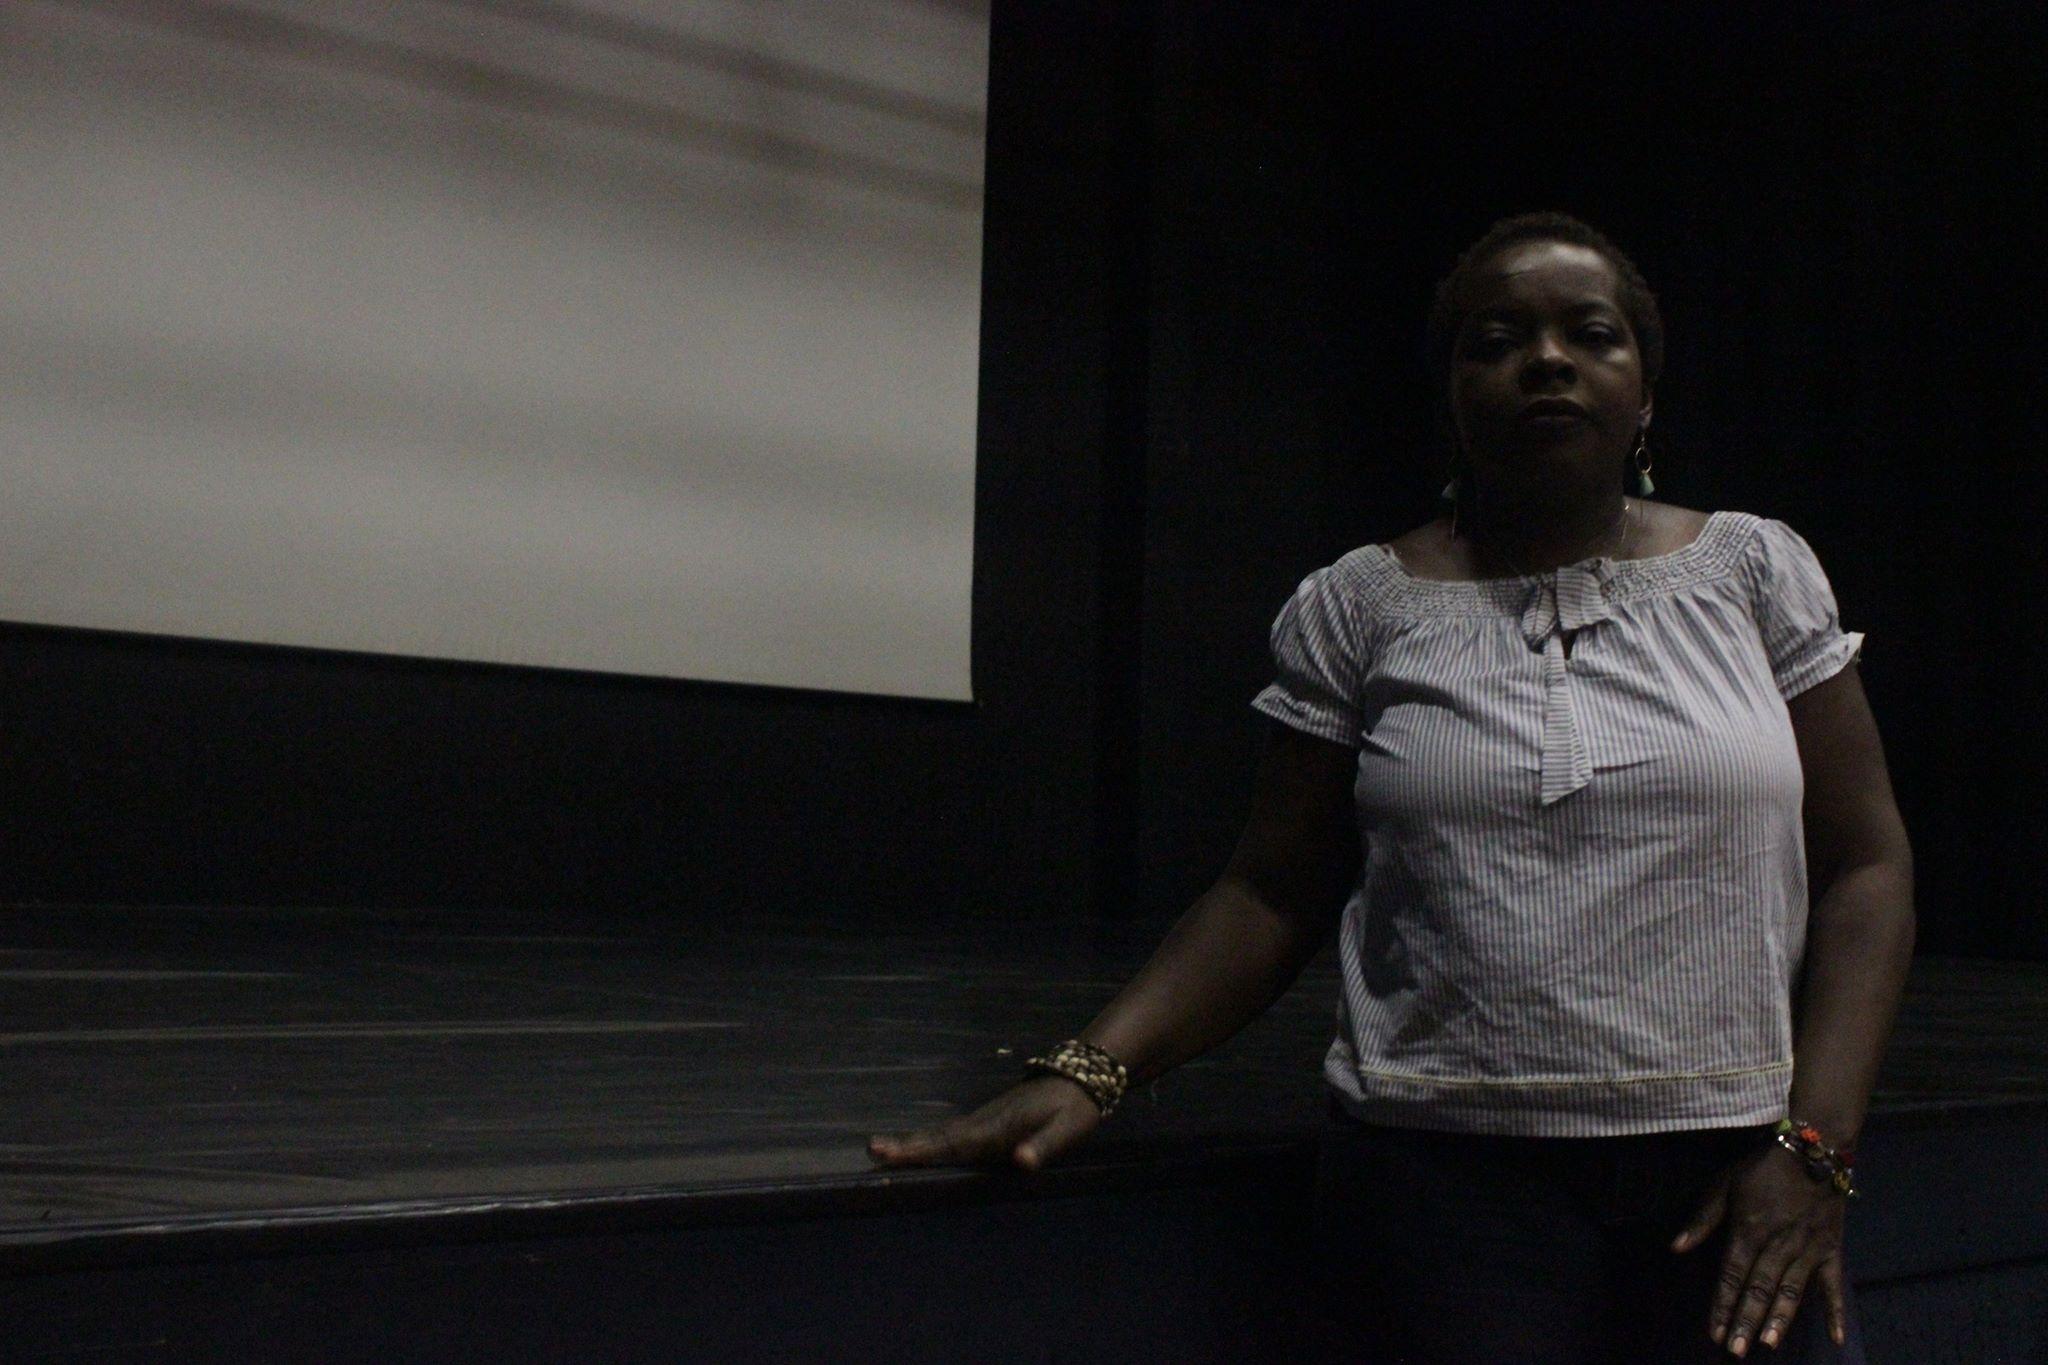 Corinne Kibongui-Saminou